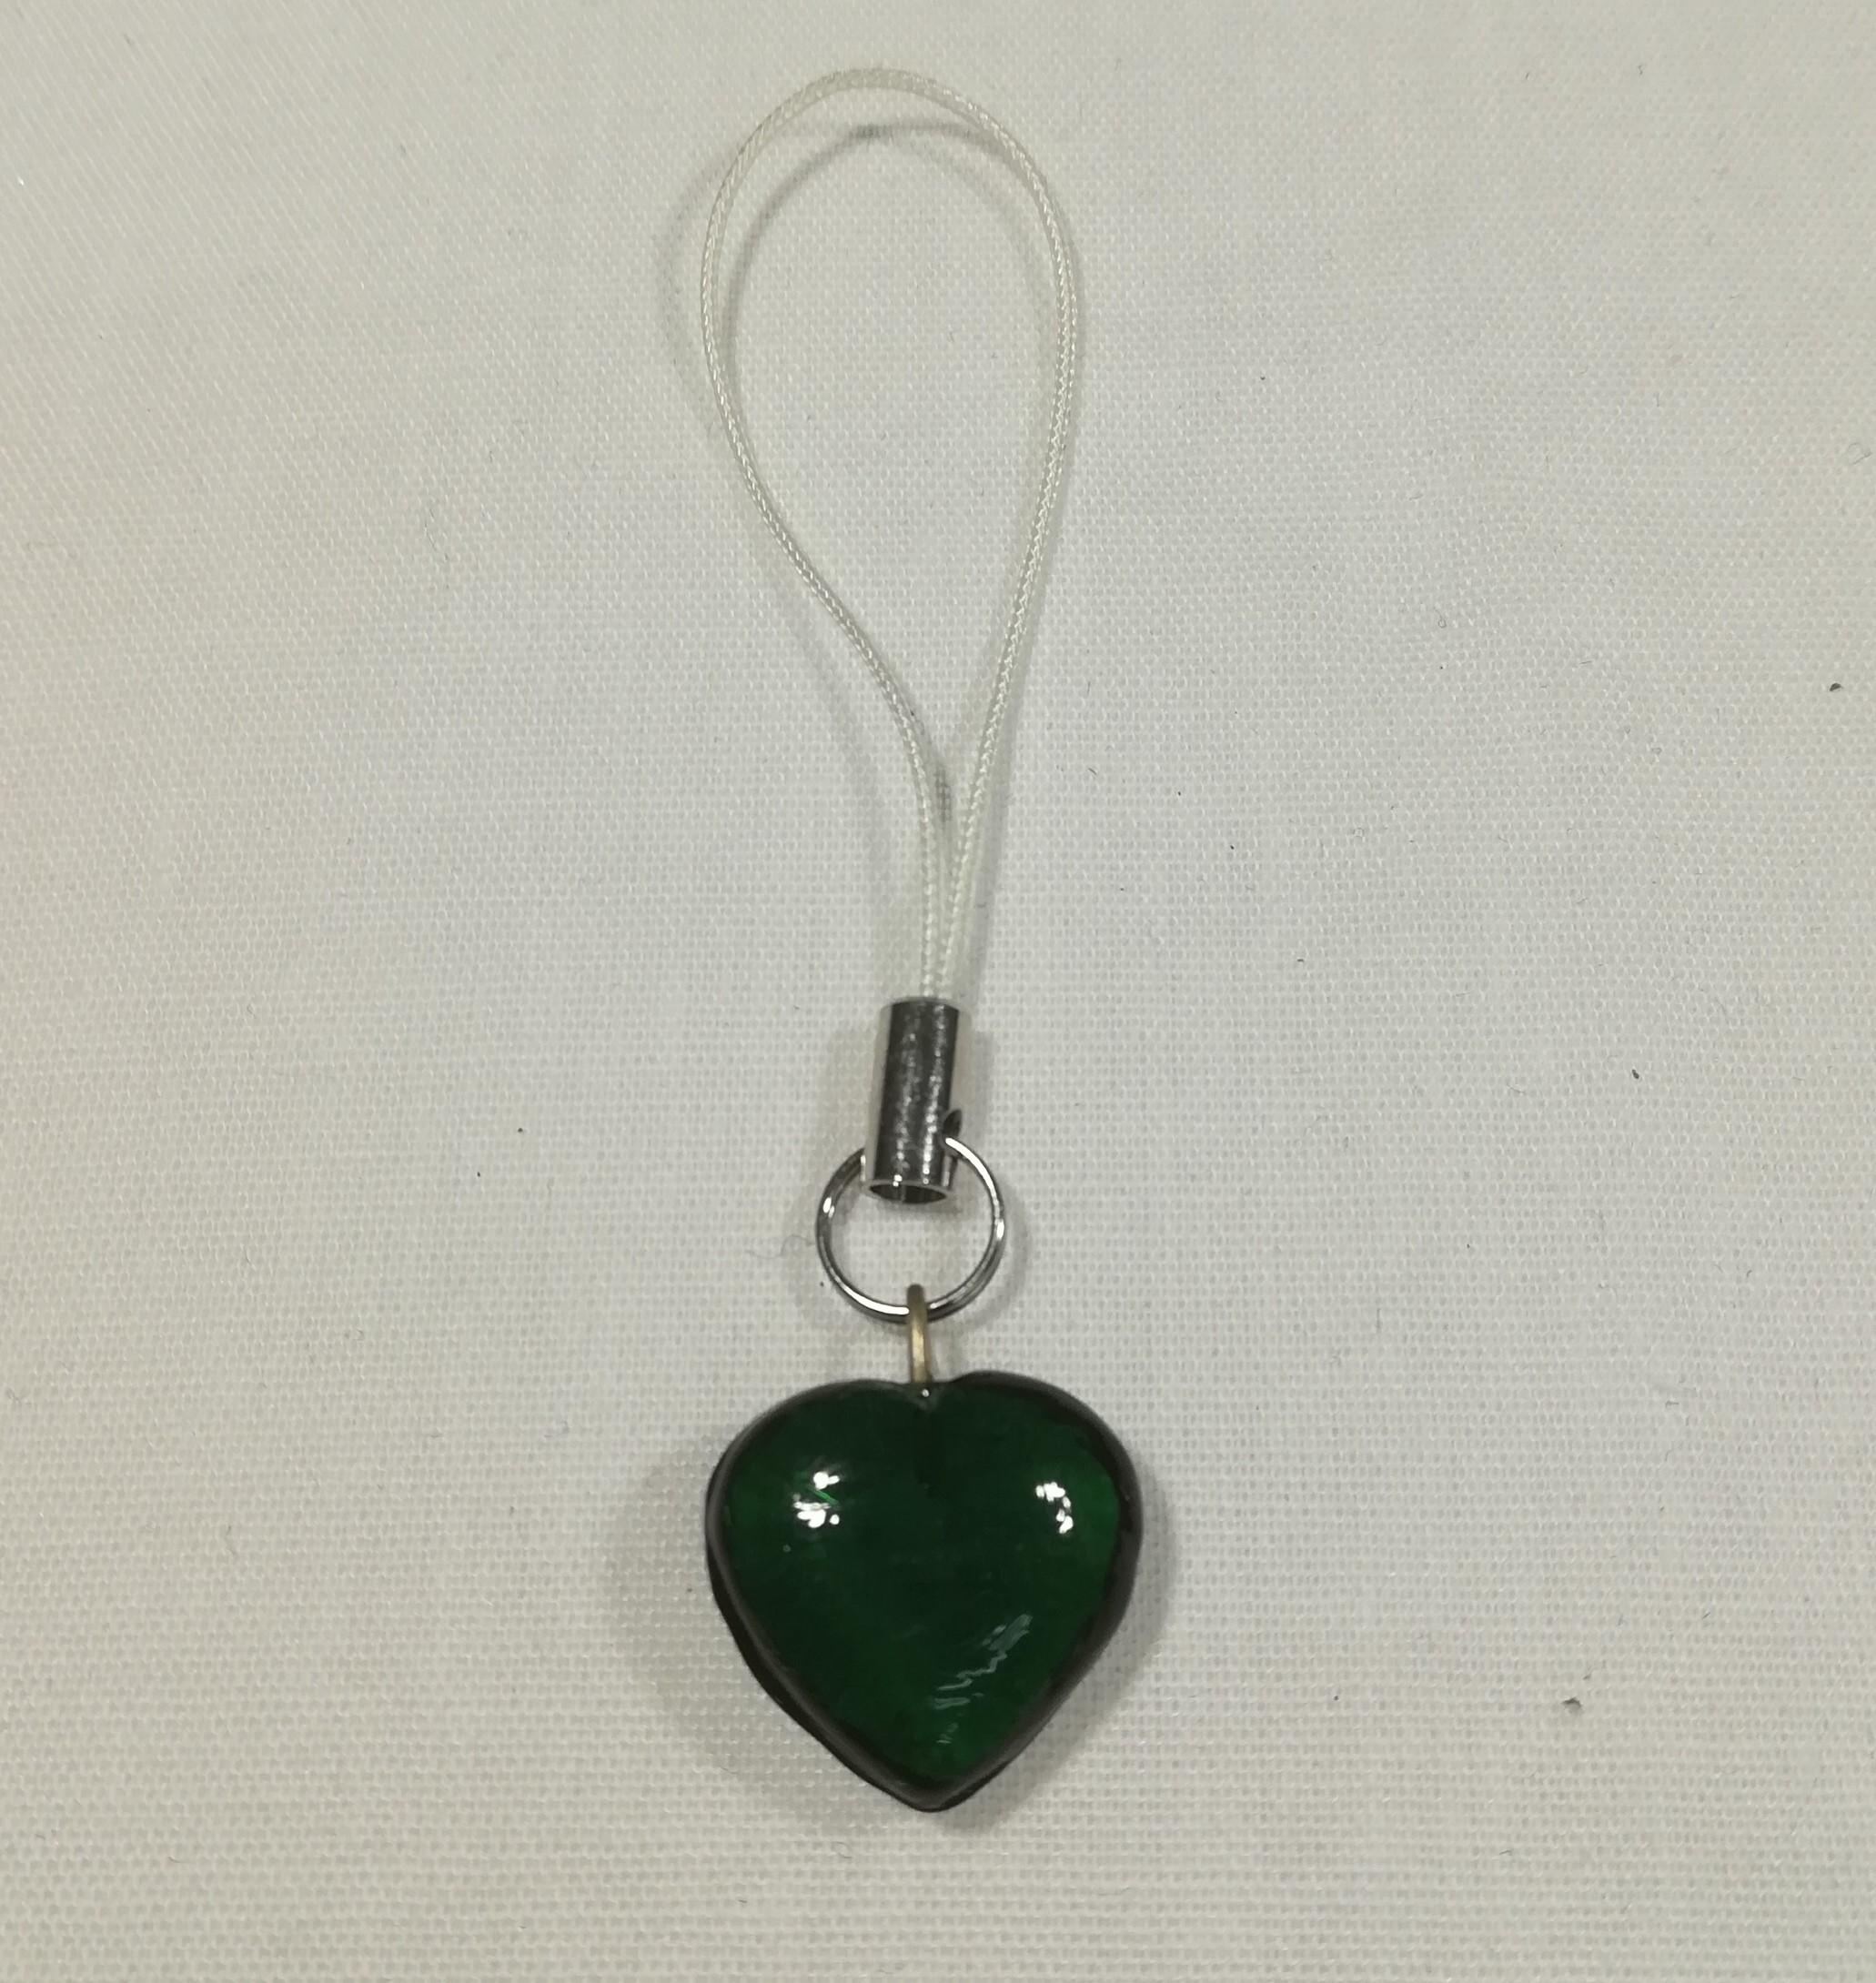 Handmade Mobile Phone Charm - Green Glass Heart